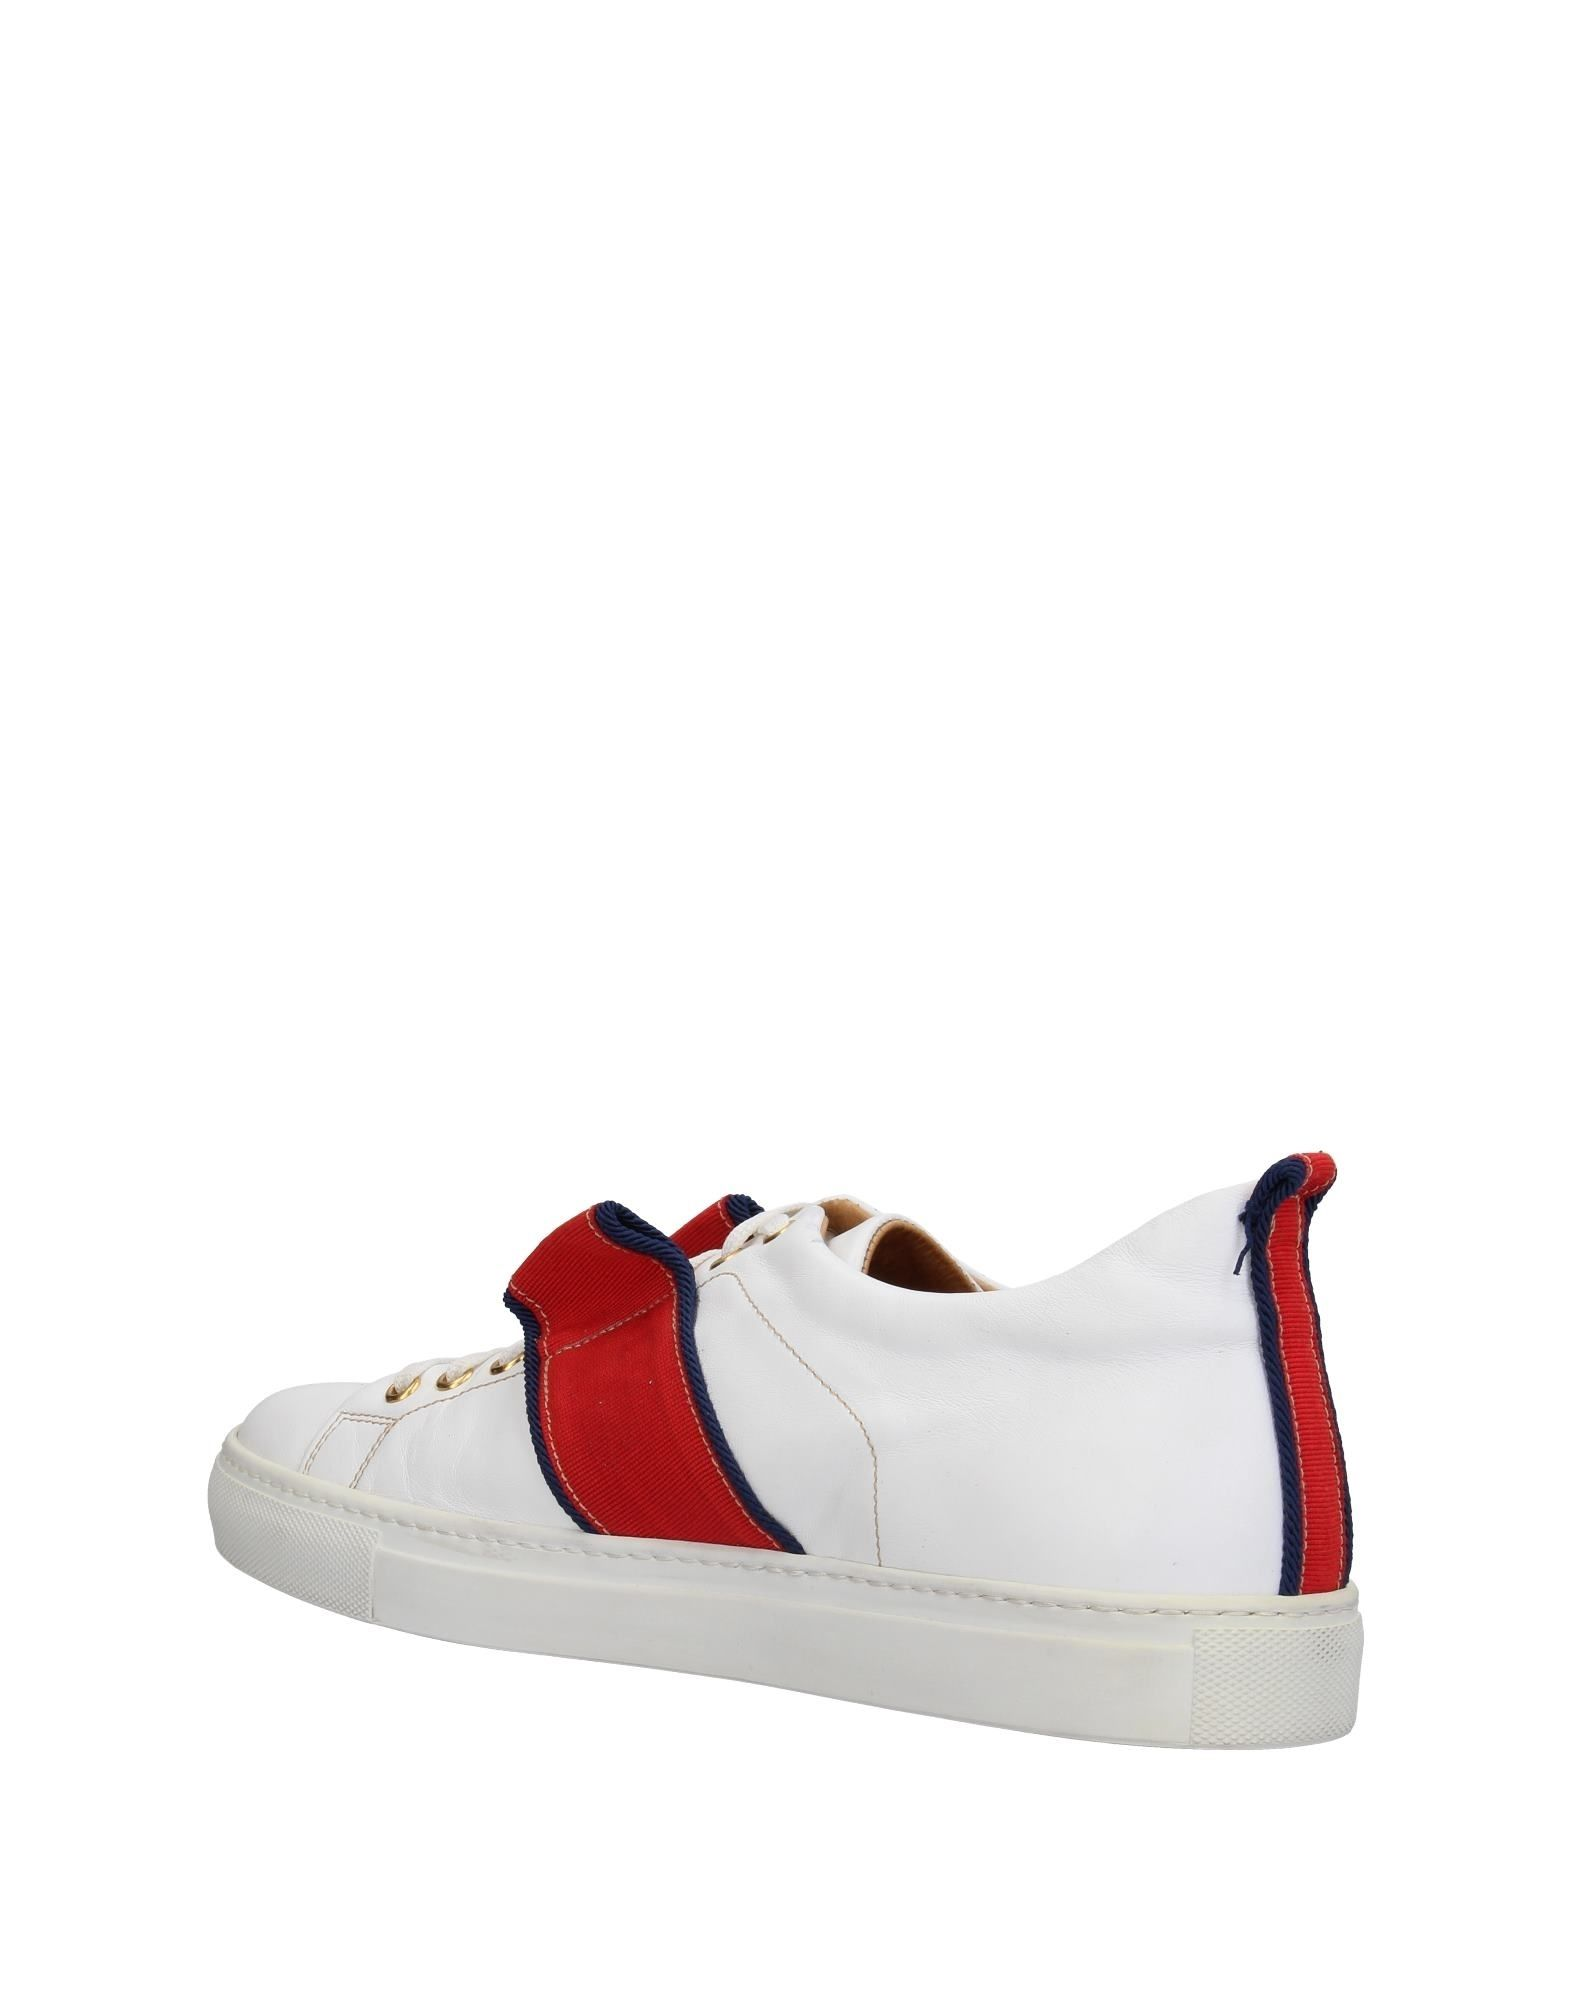 Sneakers Christian Pellizzari Homme - Sneakers Christian Pellizzari sur